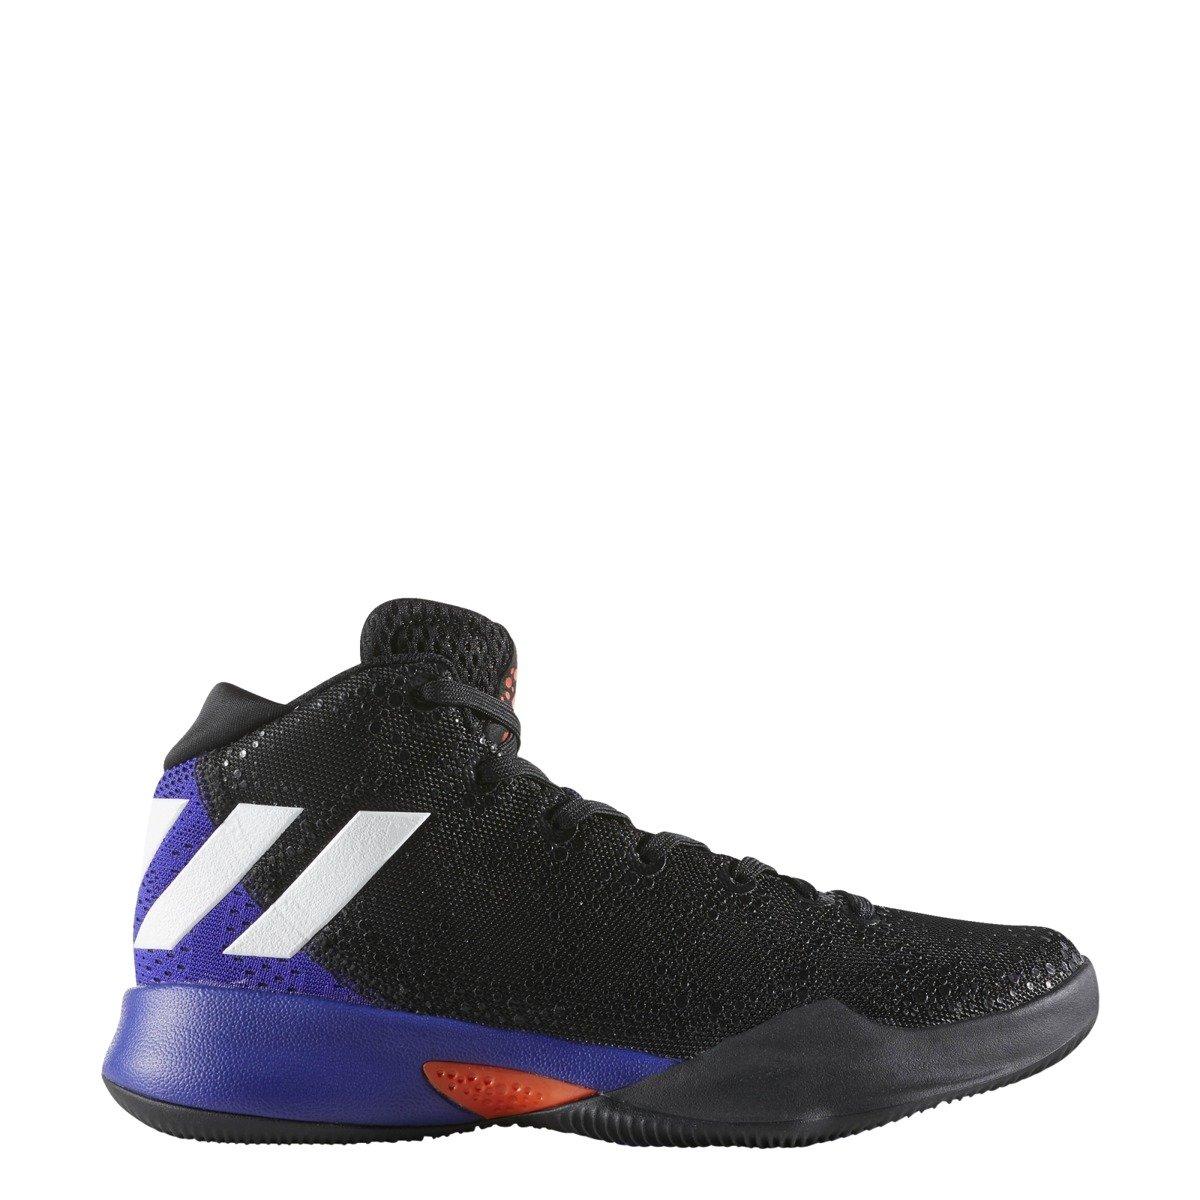 47289216701 Adidas Crazy Heat - BW1103